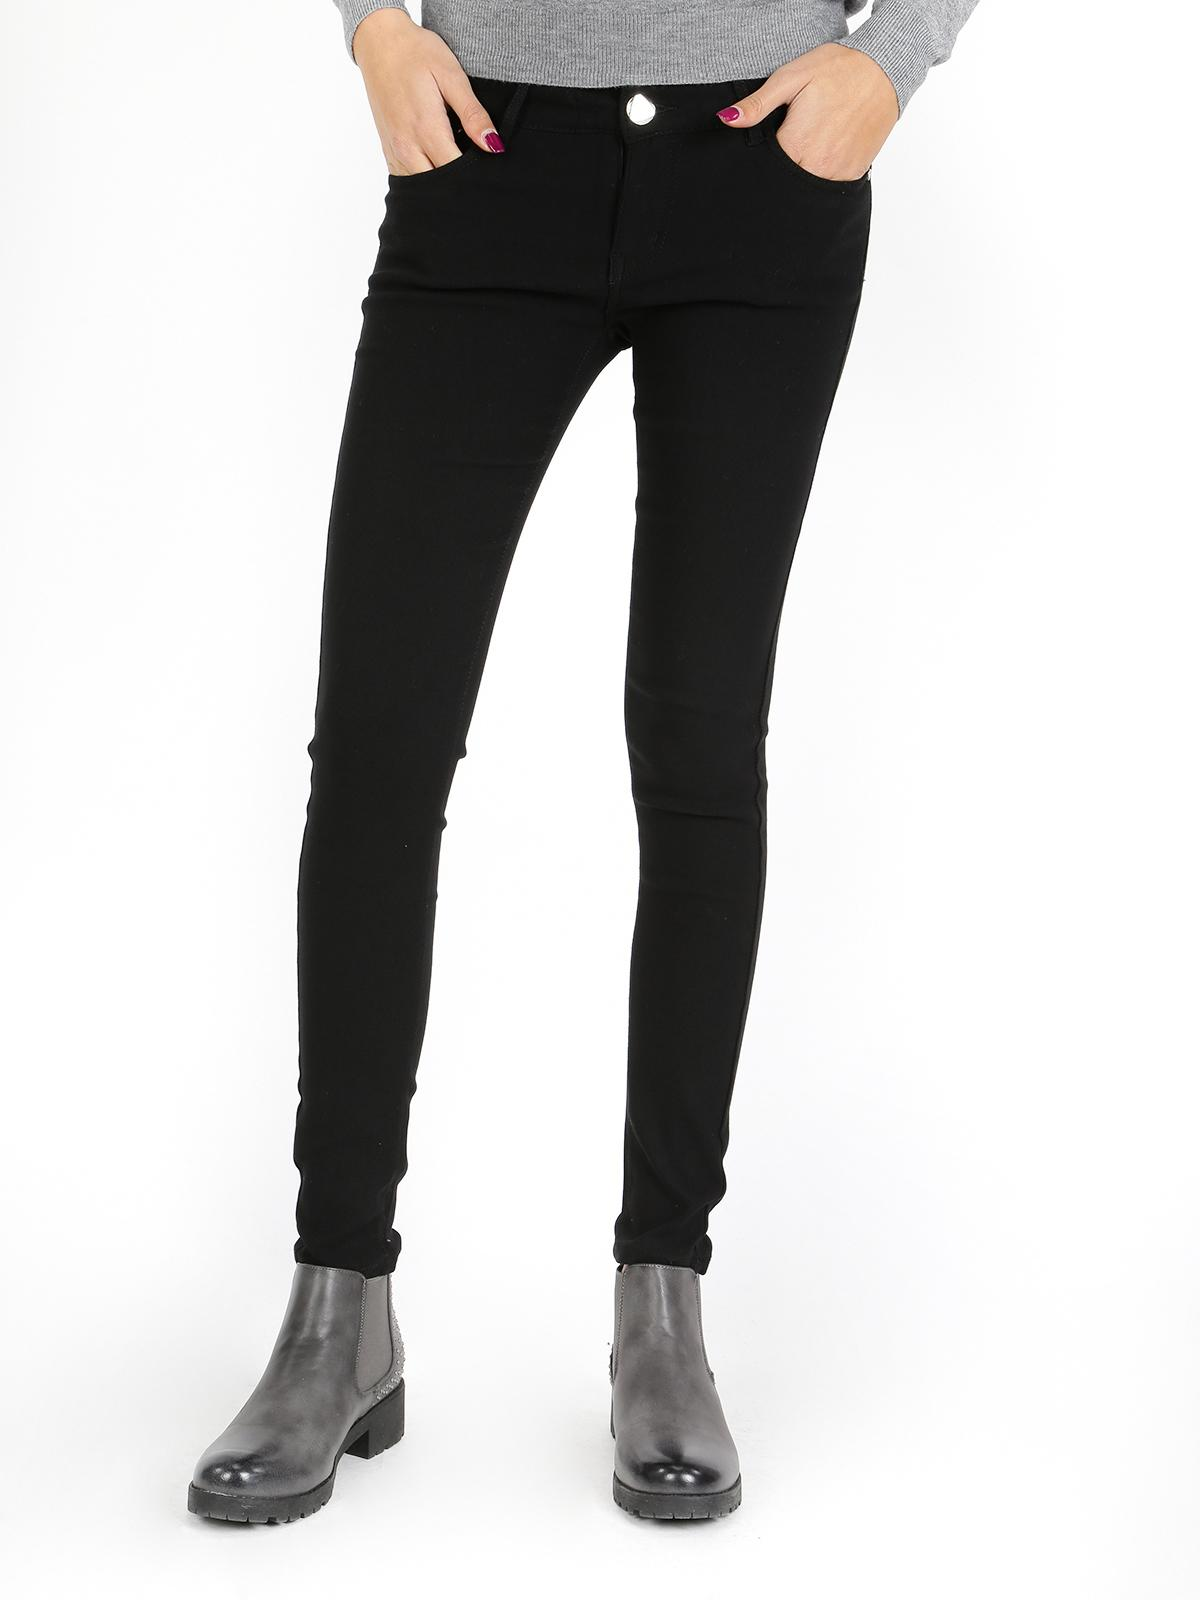 rivenditore di vendita 36882 a115a Pantaloni elasticizzati solada | MecShopping